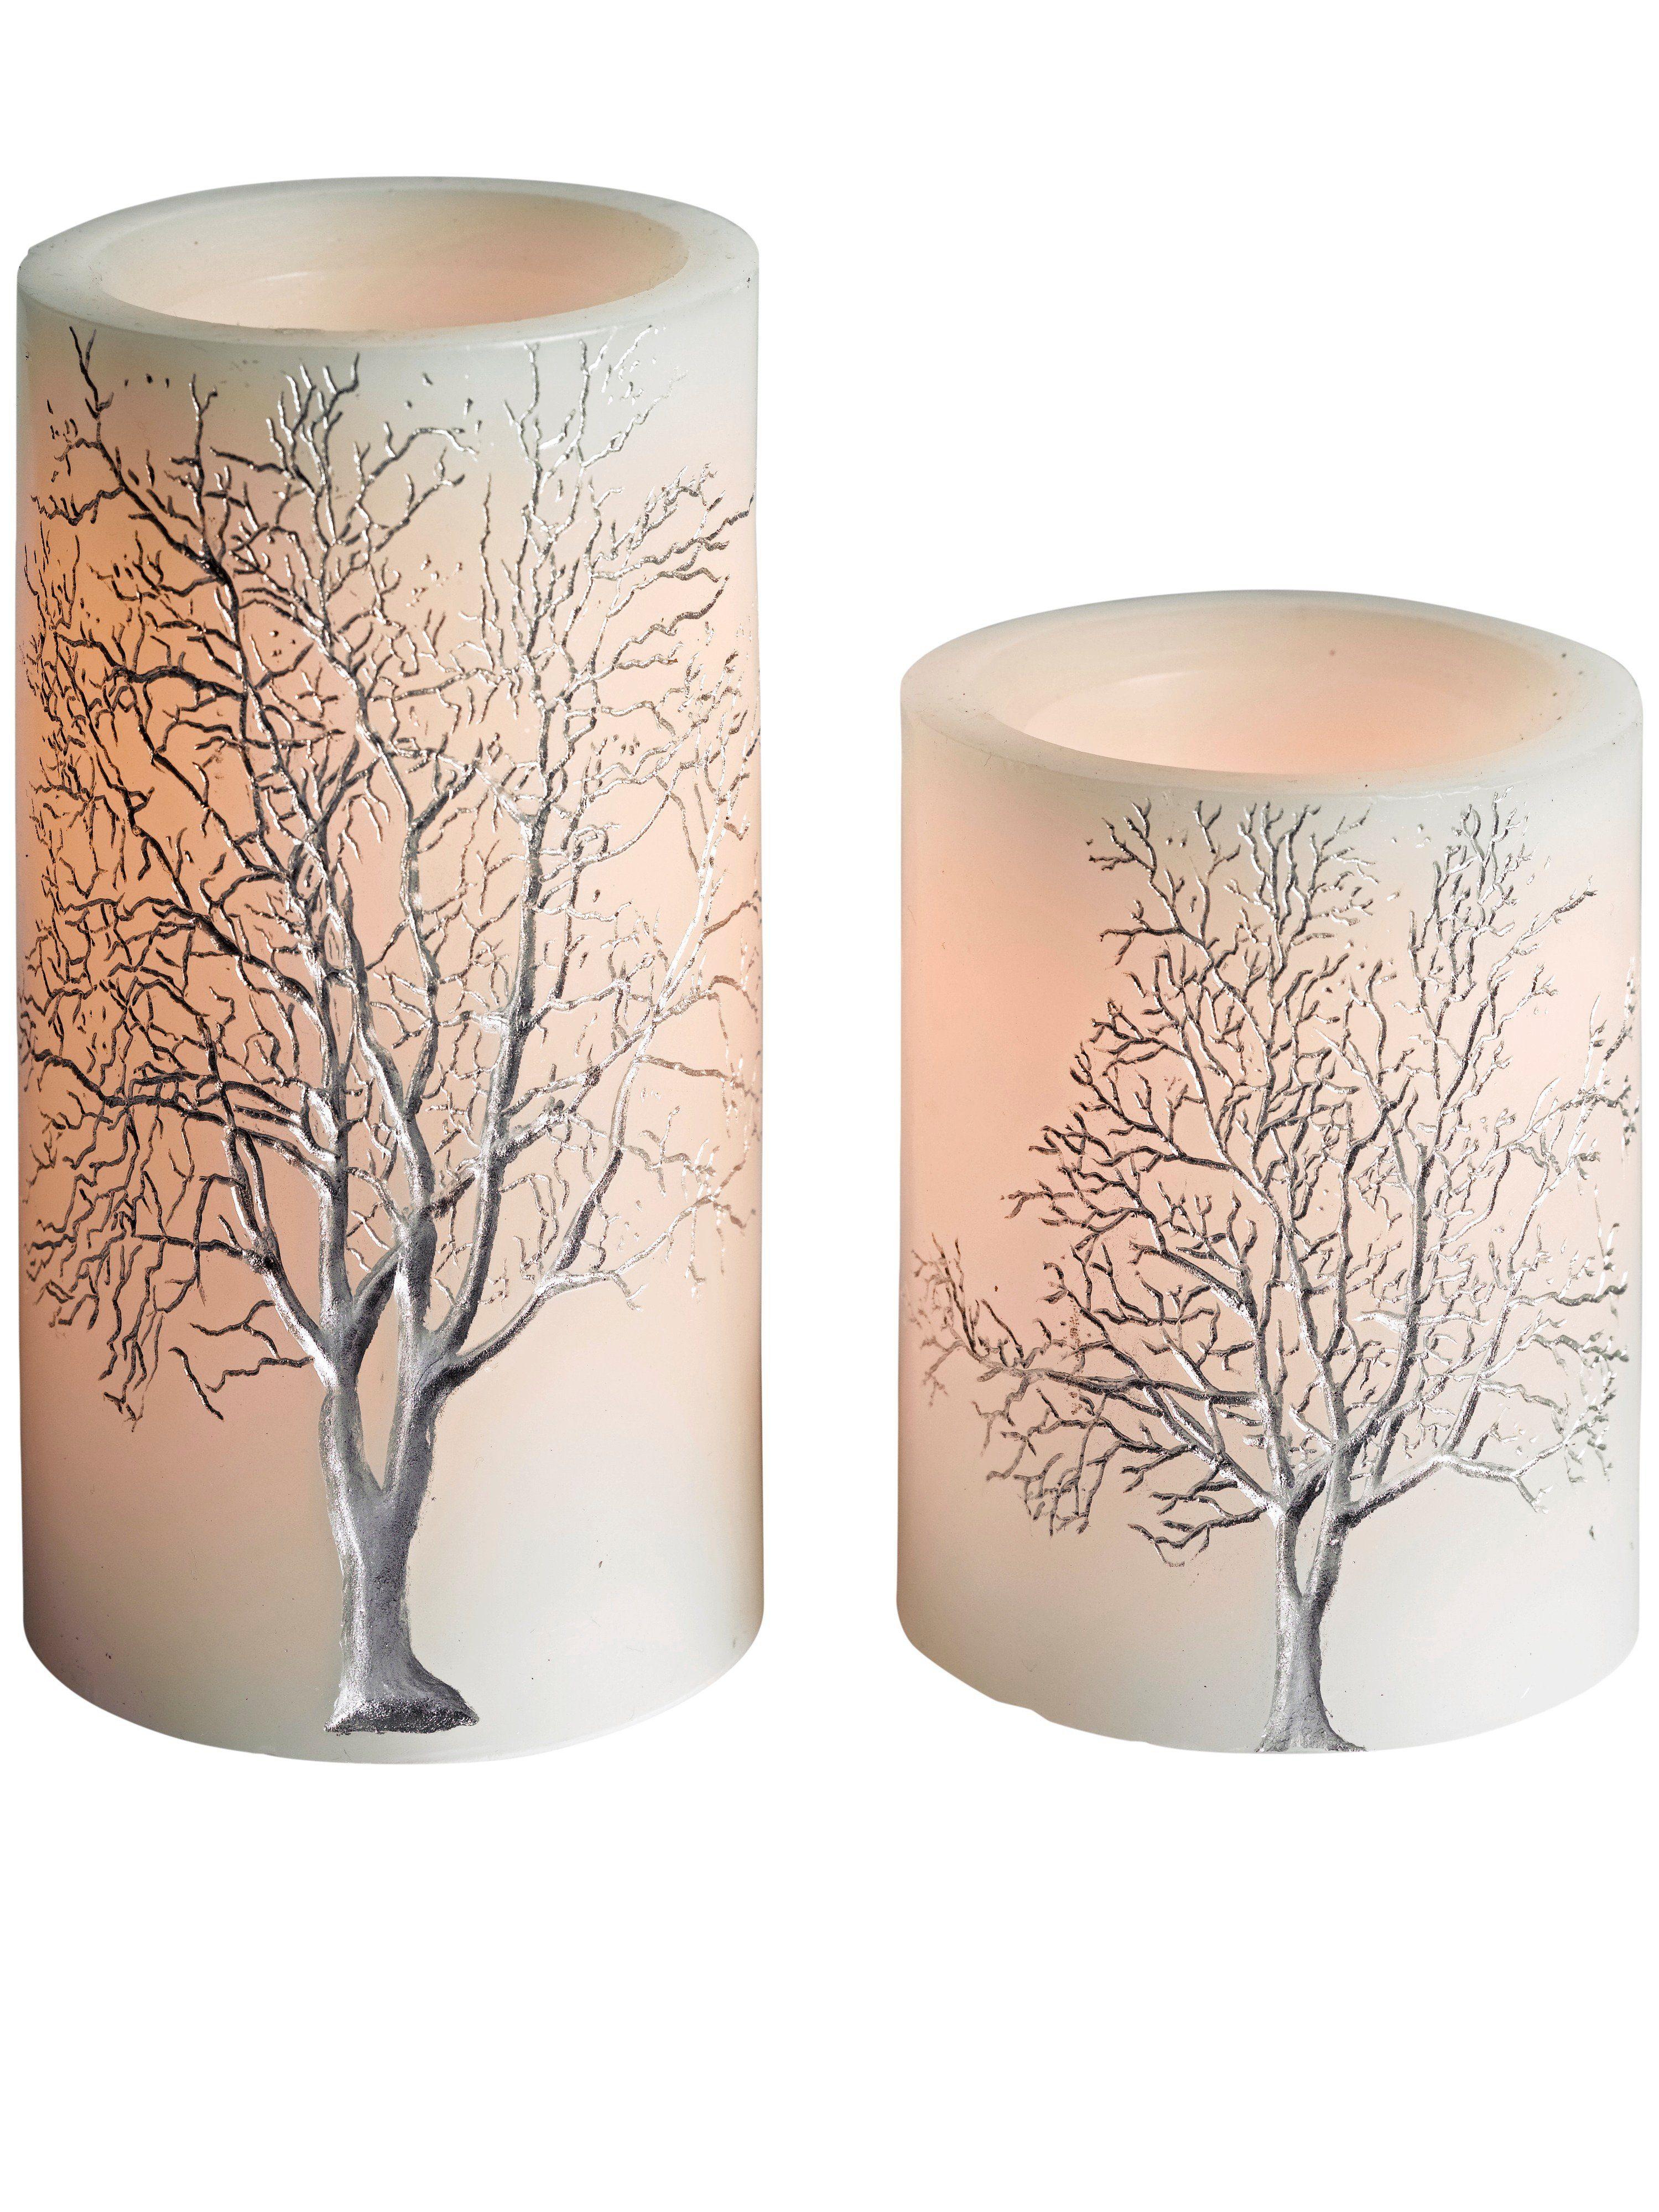 heine home LED-Kerzen, 2er-Set In Rinden-Optik